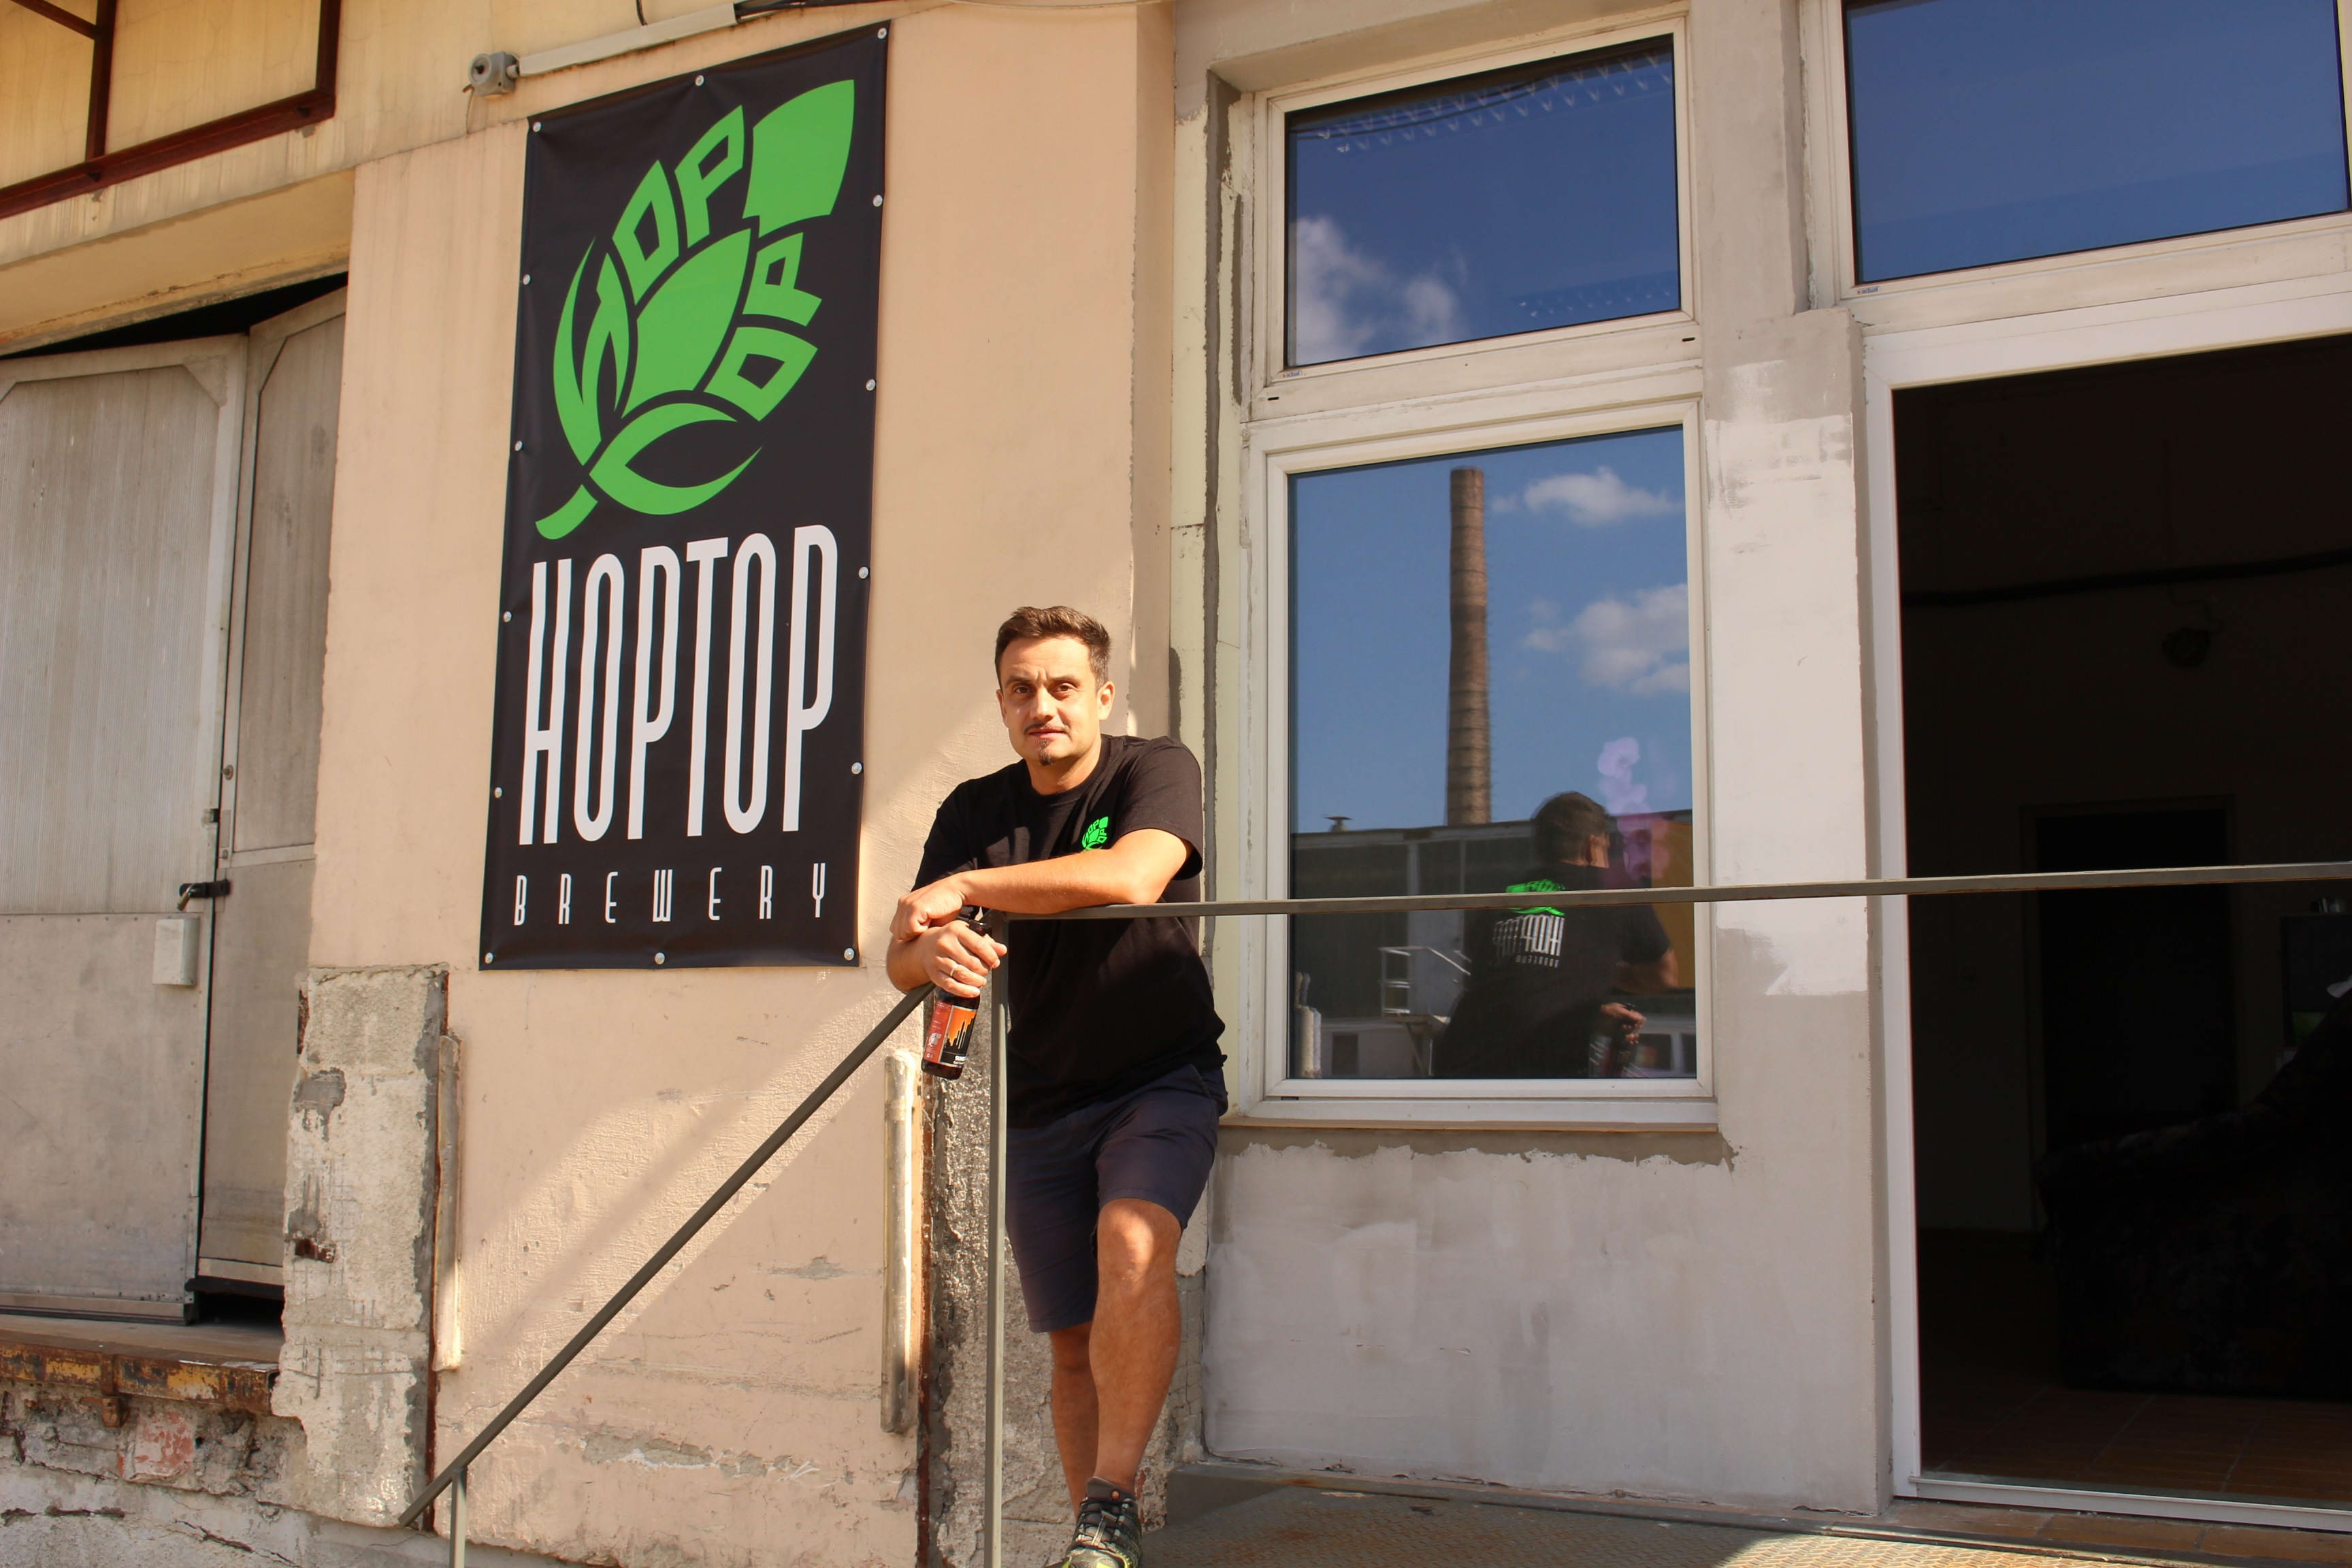 Csúcsra tör a HopTop Brewery